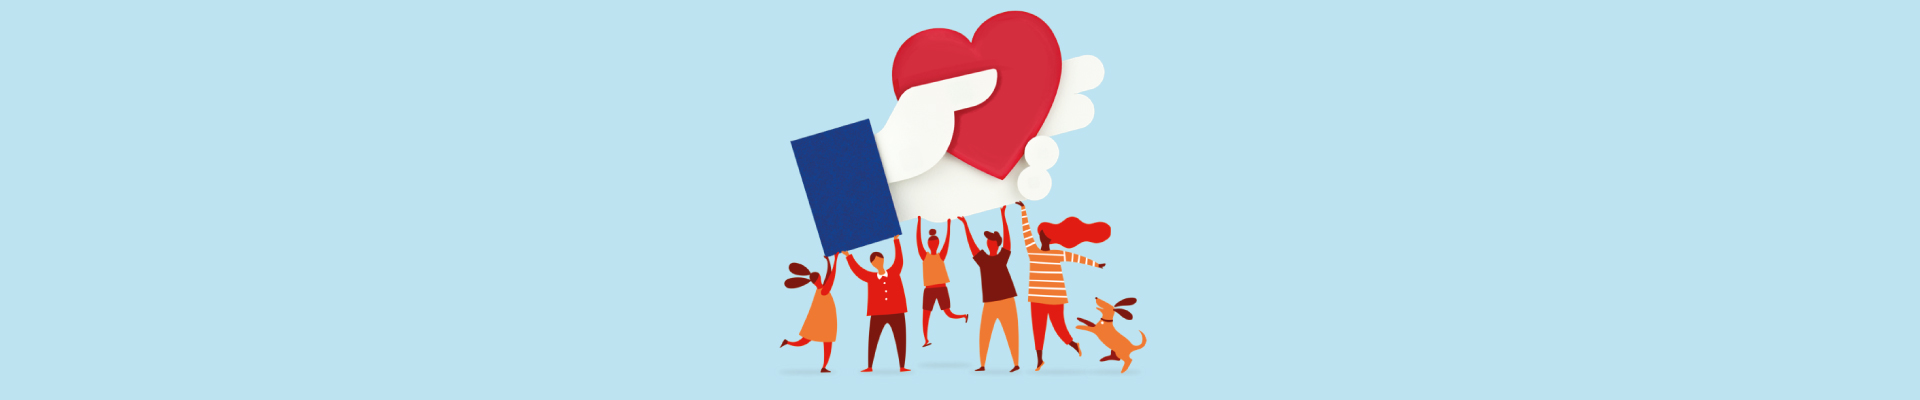 Donazioni Facebook - LILT Biella